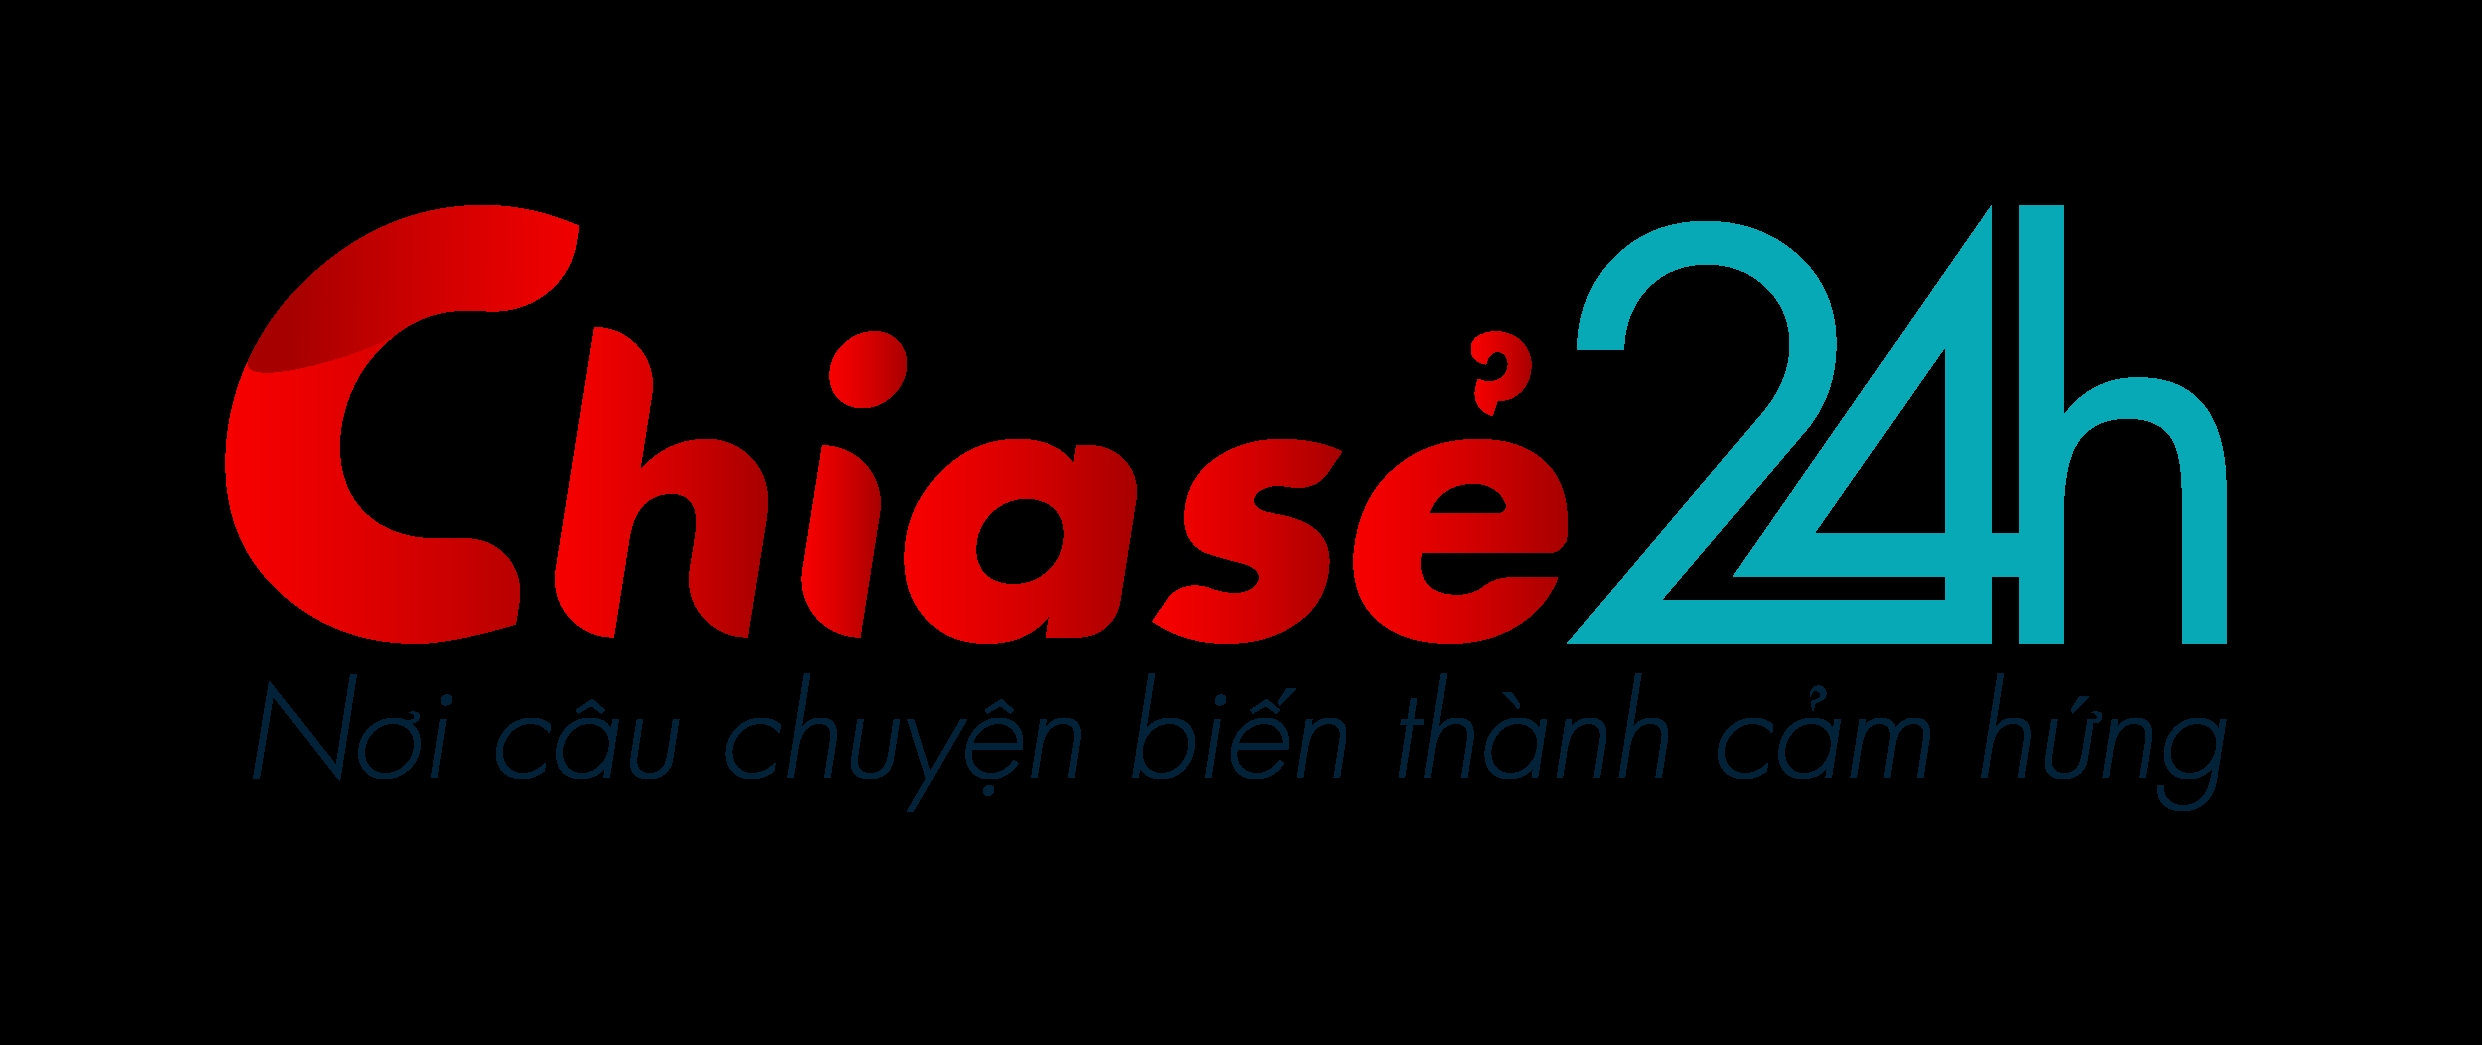 Chia se24h (@chiase24h) Cover Image